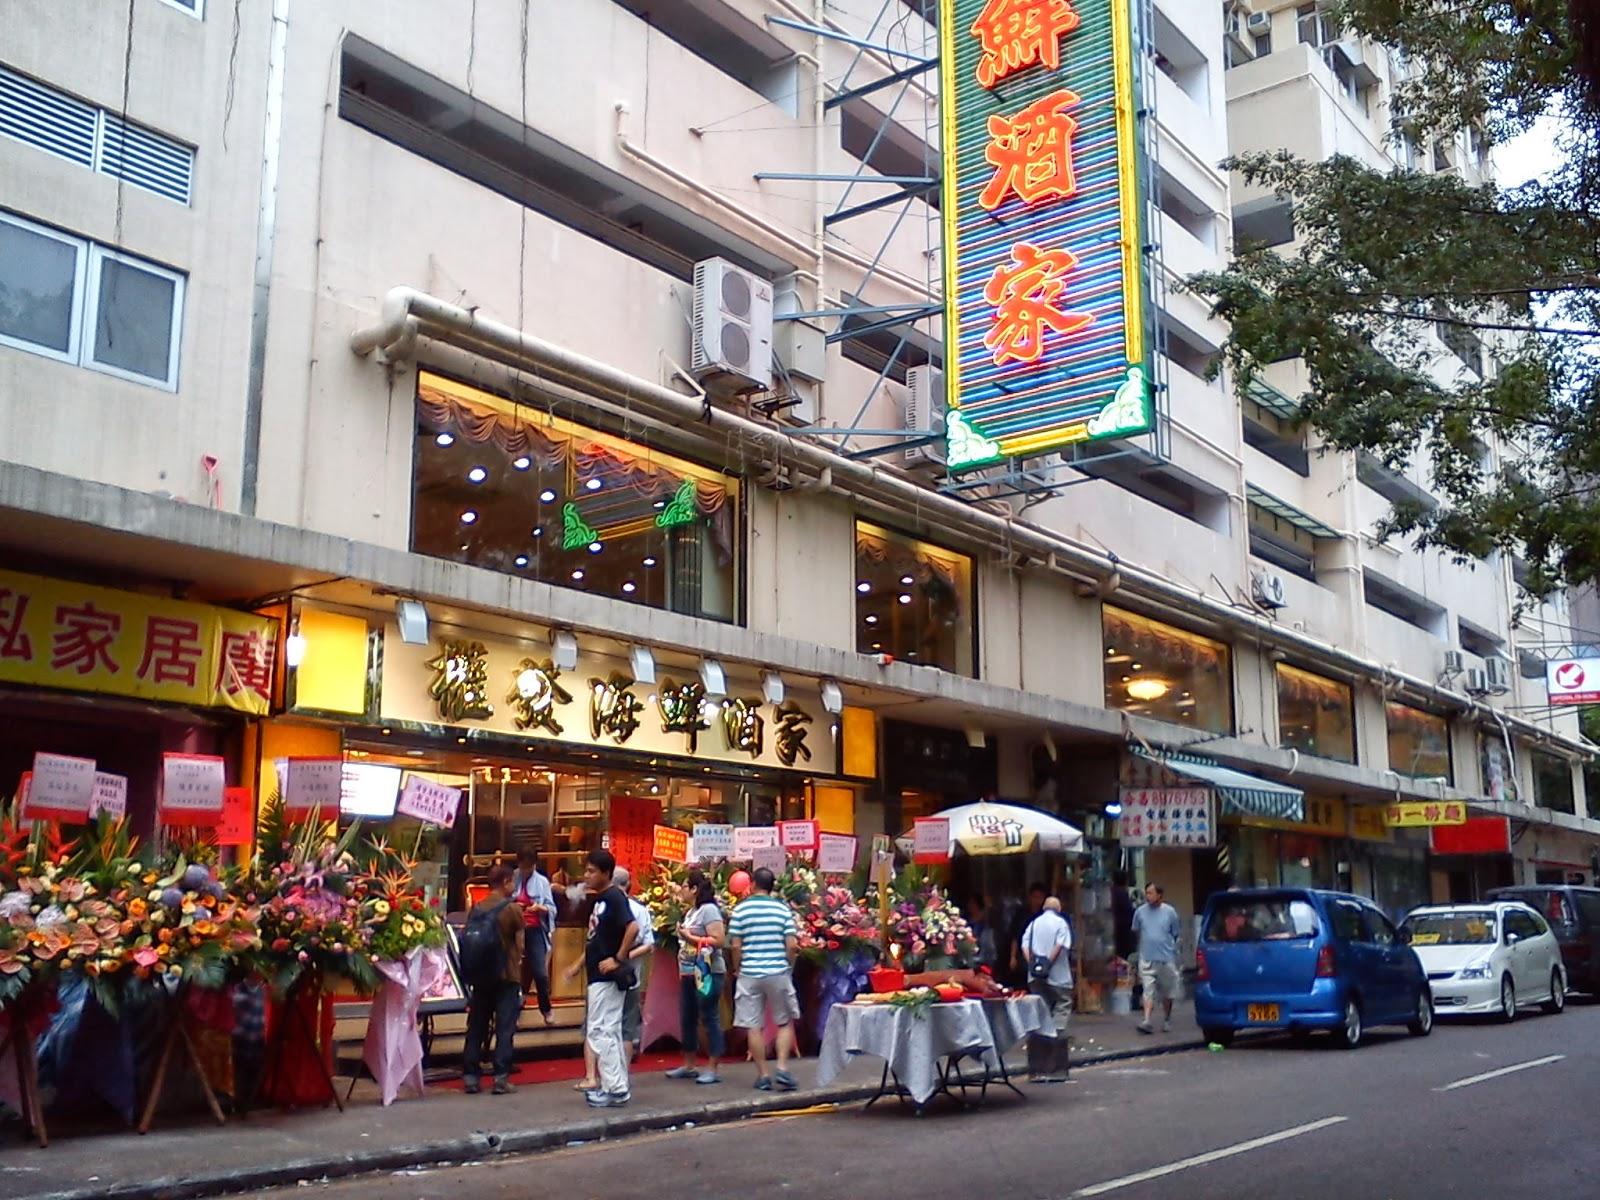 Grassroots O2: 柴灣永利中心.商舖租售個案